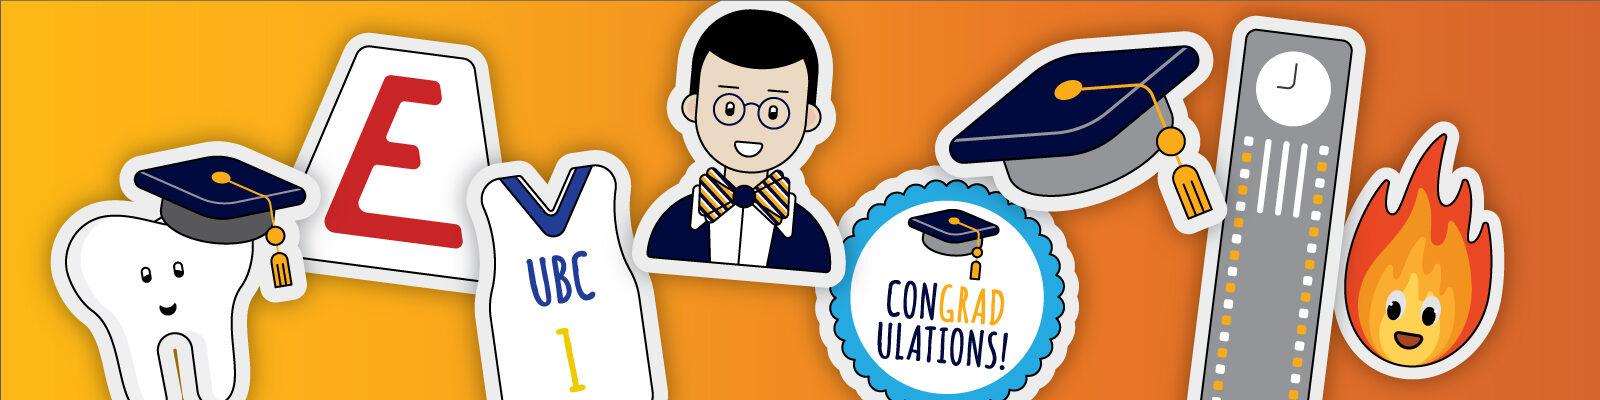 alumni UBC Stickers App